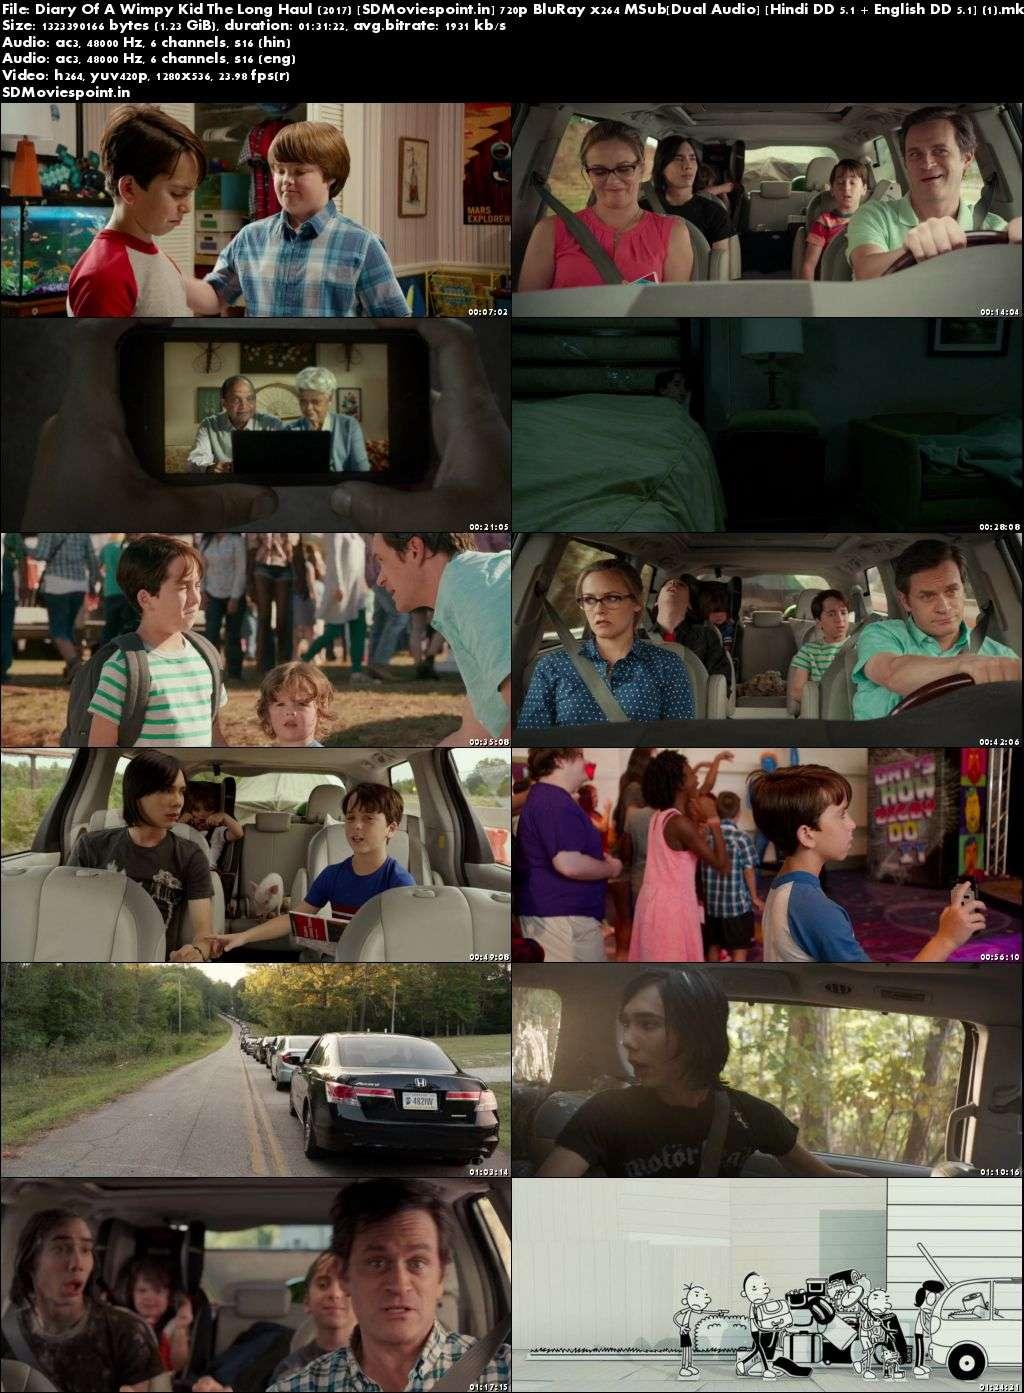 Screen Shots Diary of a Wimpy Kid: The Long Haul 2017 Download Dual Audio Hindi 720p Free